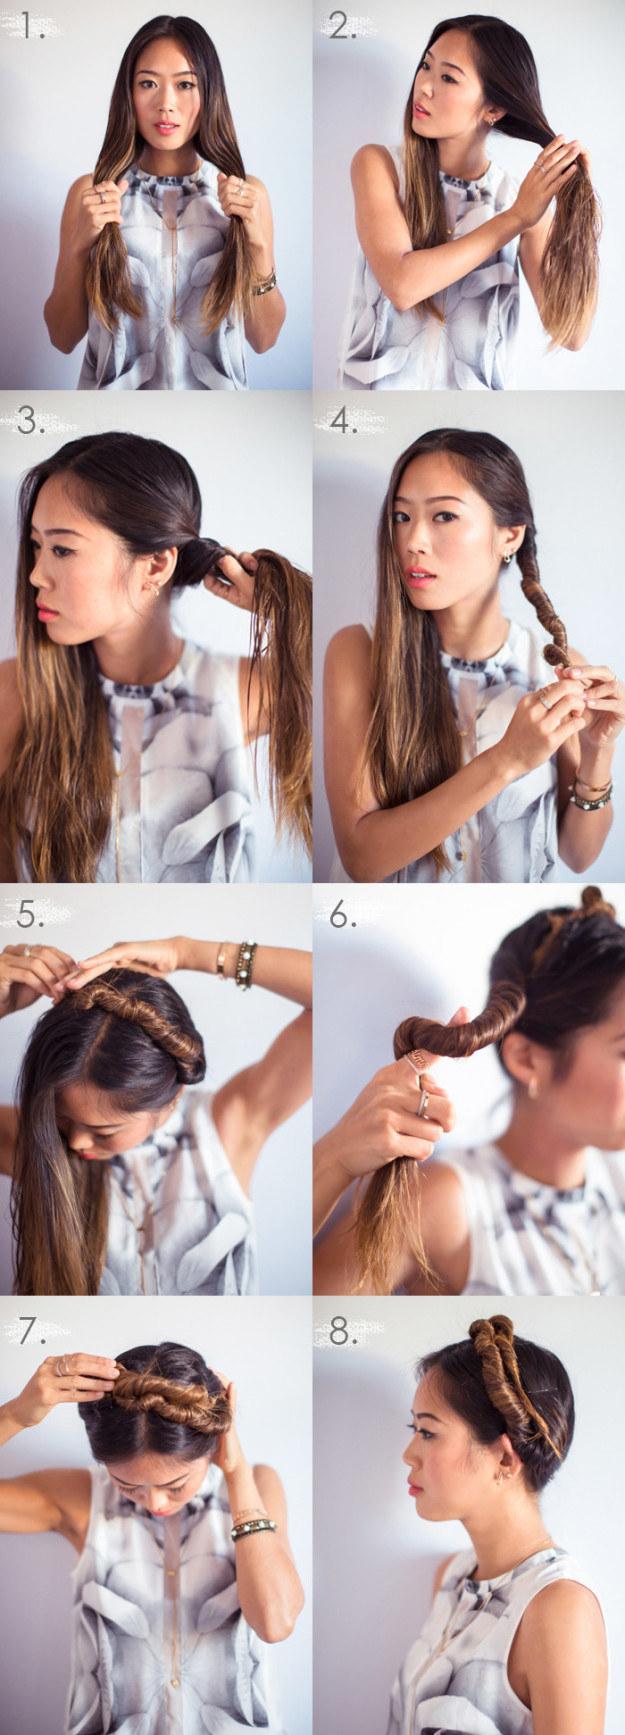 8 szuper frizura iskolakezdéshez